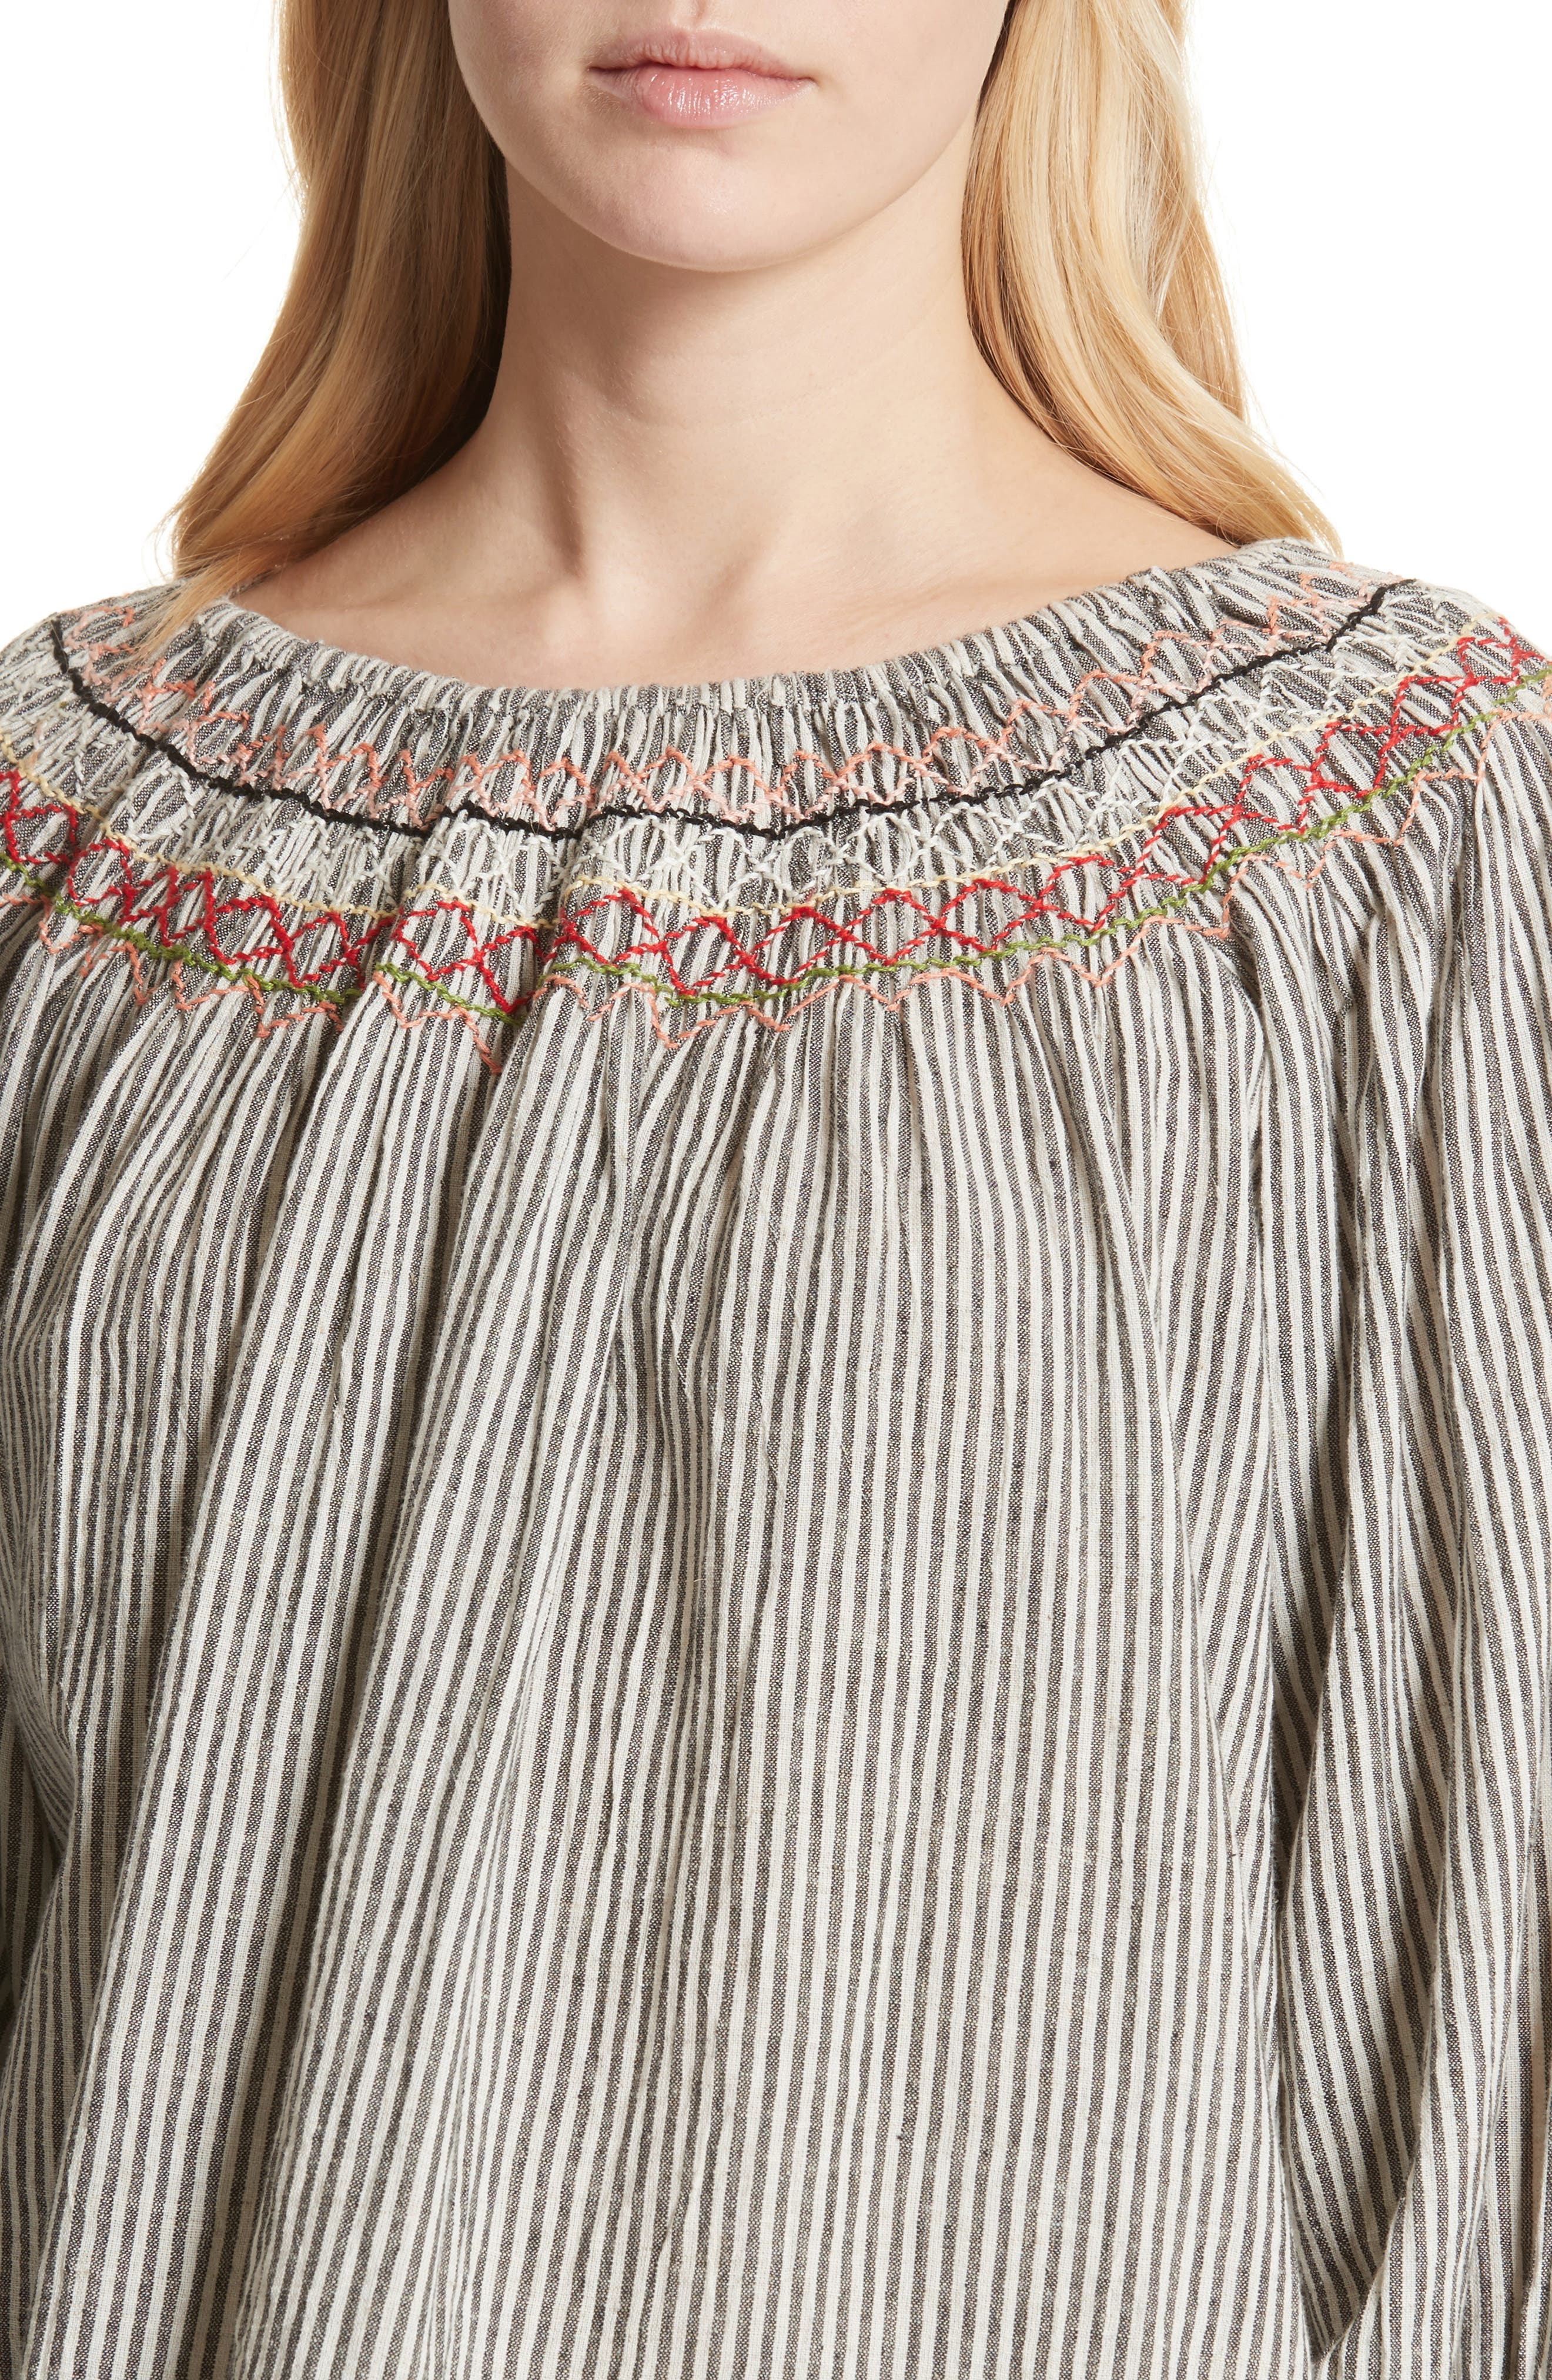 The Vista Cotton & Linen Top,                             Alternate thumbnail 4, color,                             400